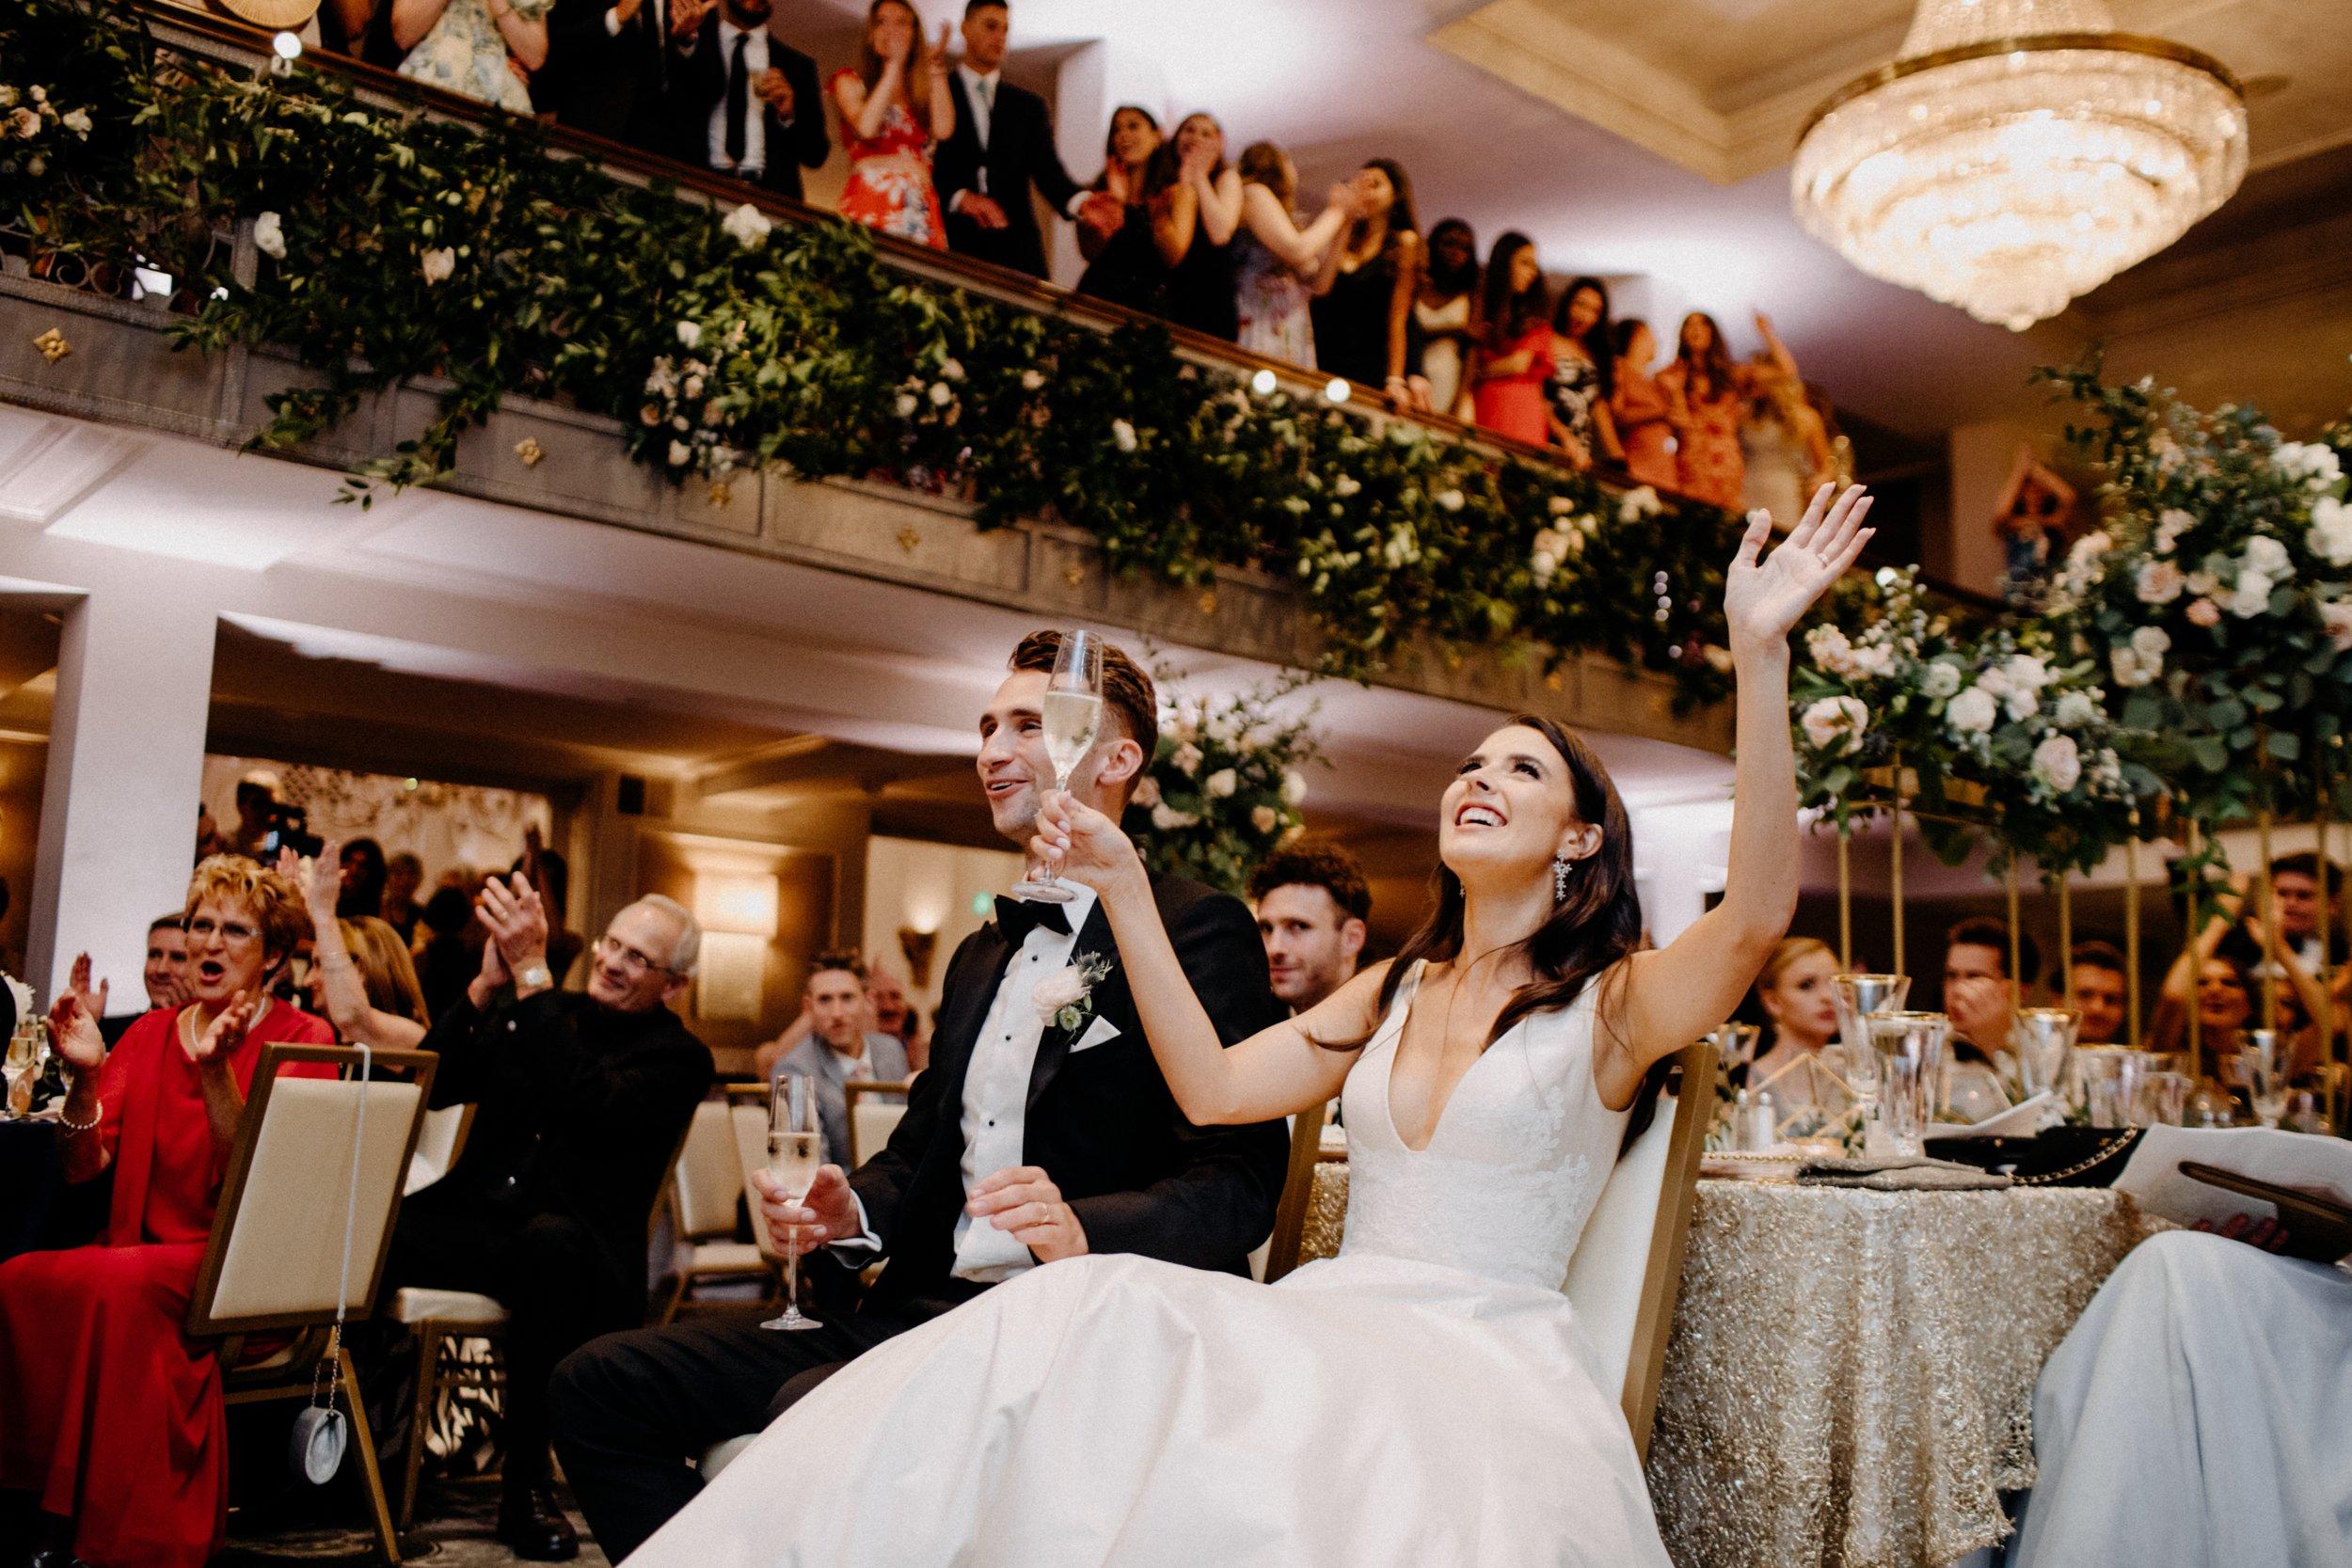 st-anthony-hotel-wedding-photography-10142san-antonio.JPG